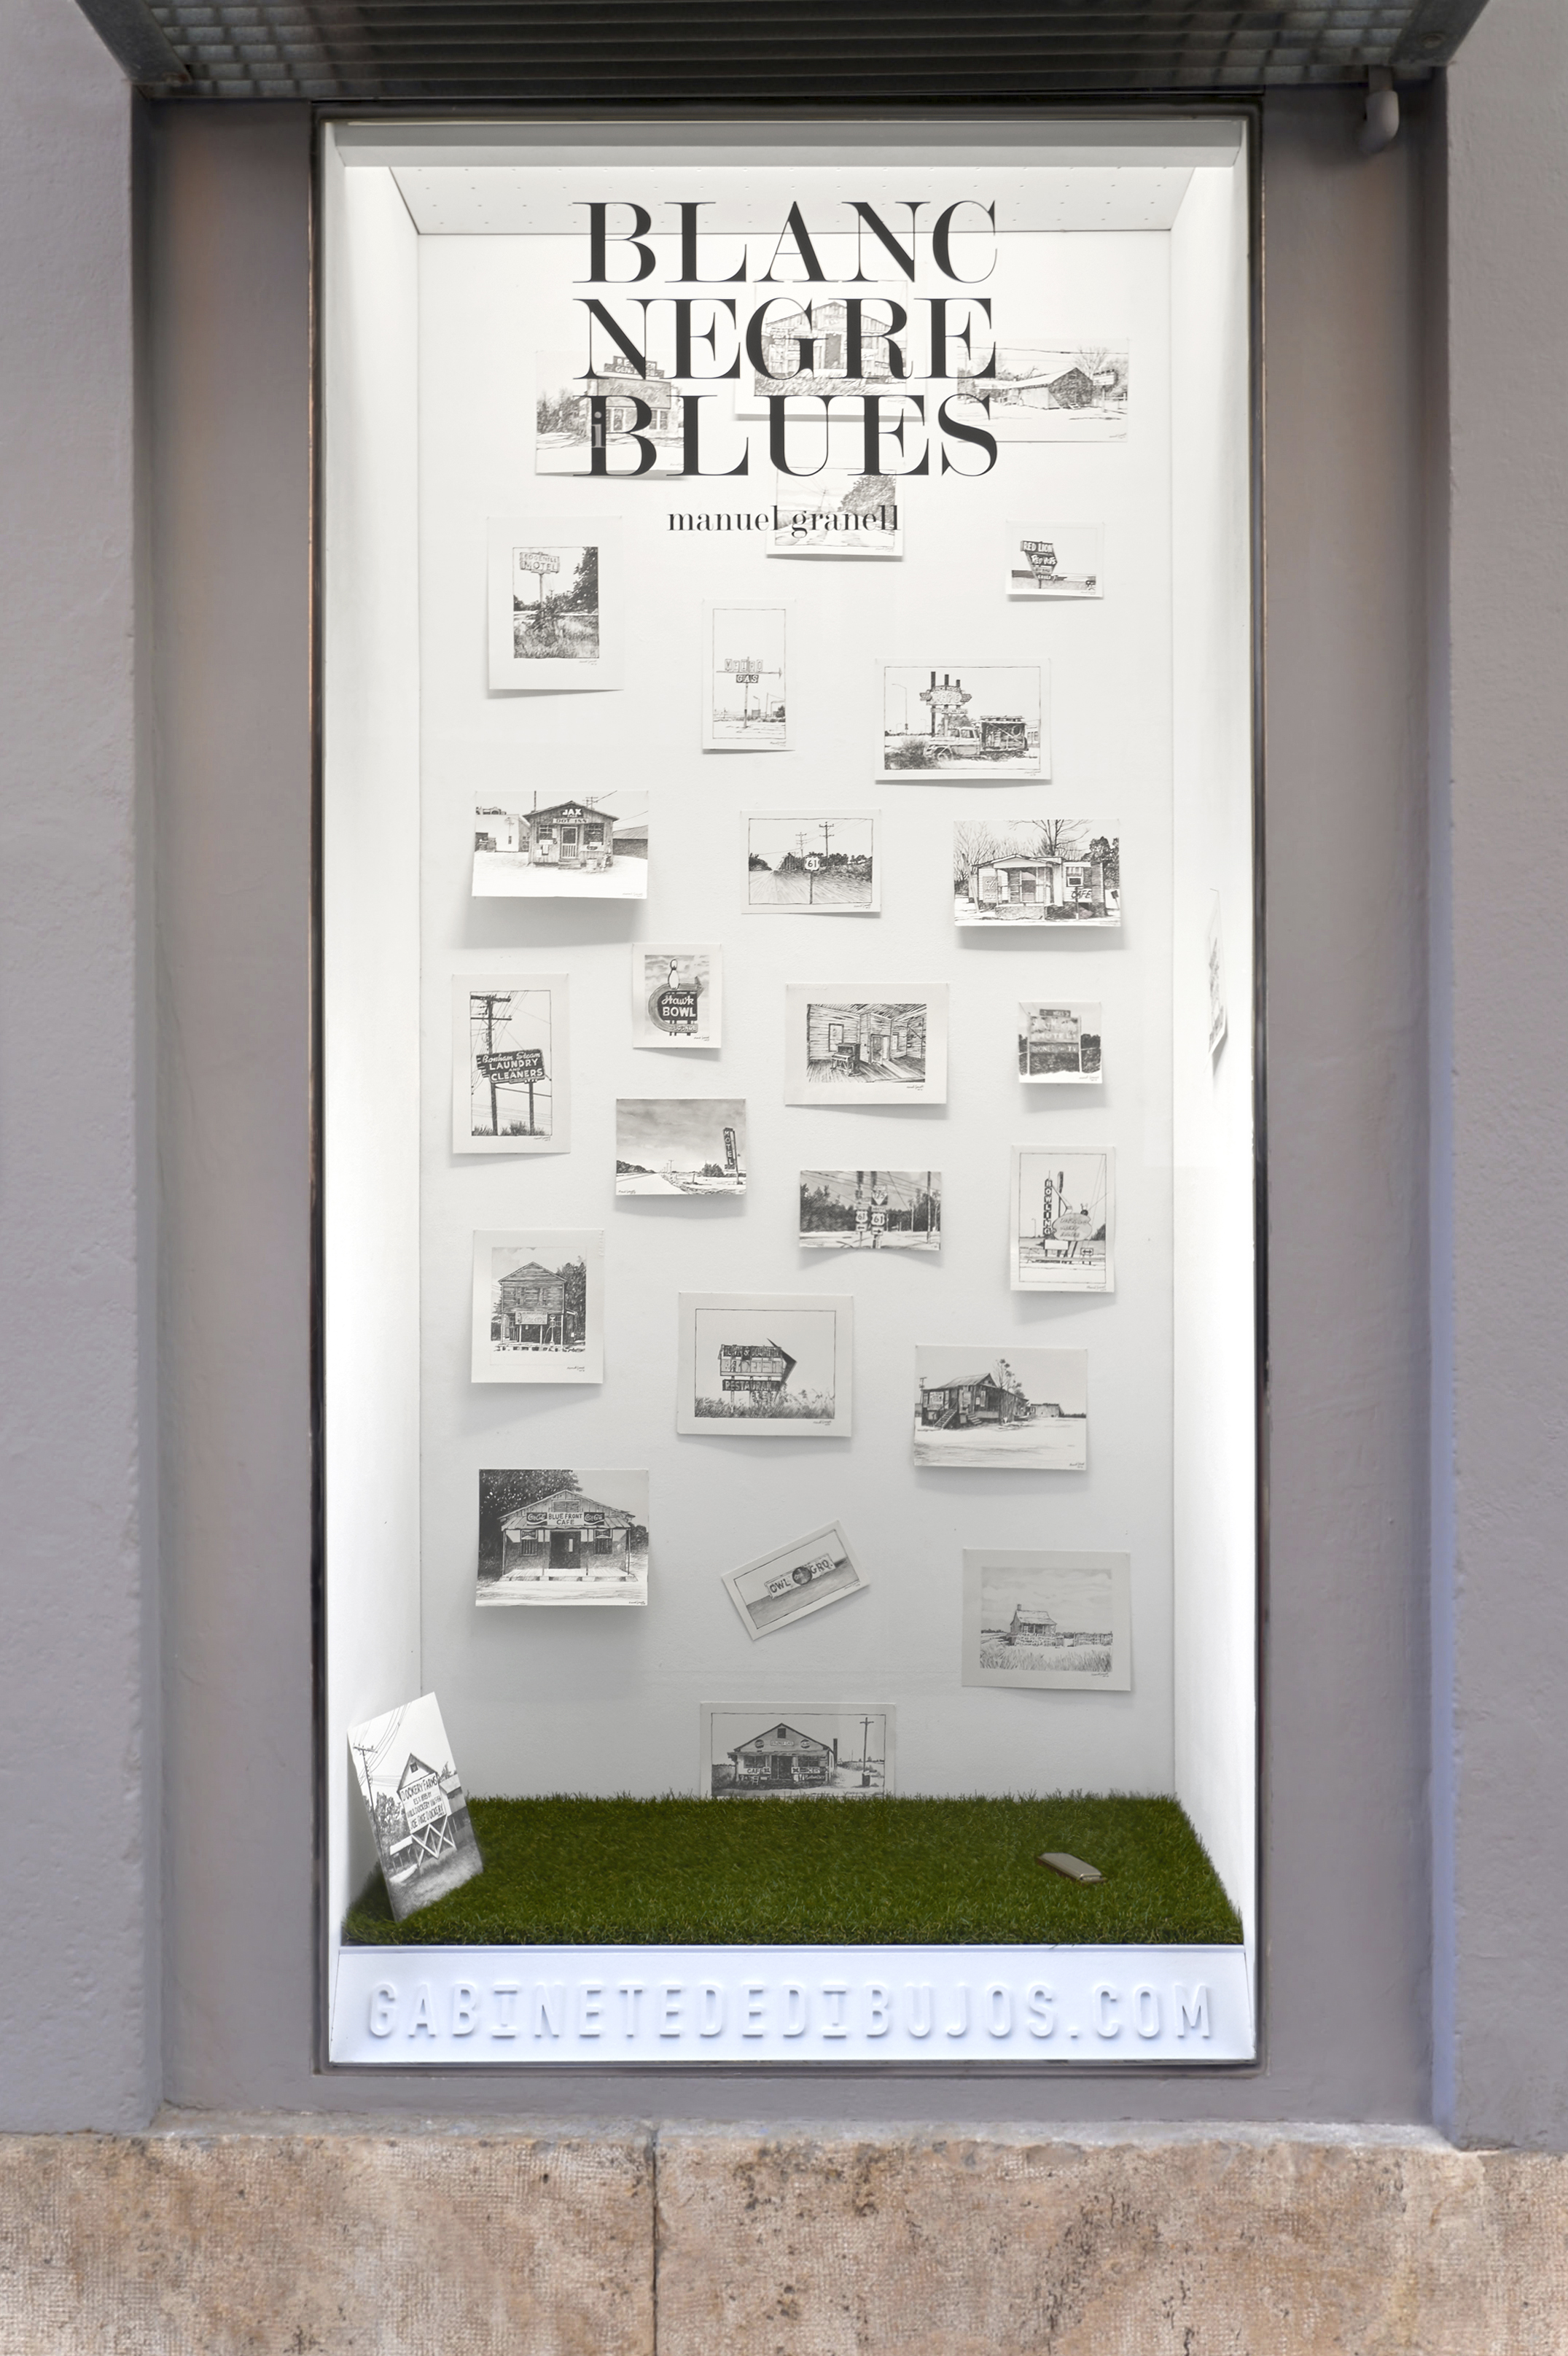 BLANC, NEGRE I BLUES de Manel Granell en el Gabinete de dibujos